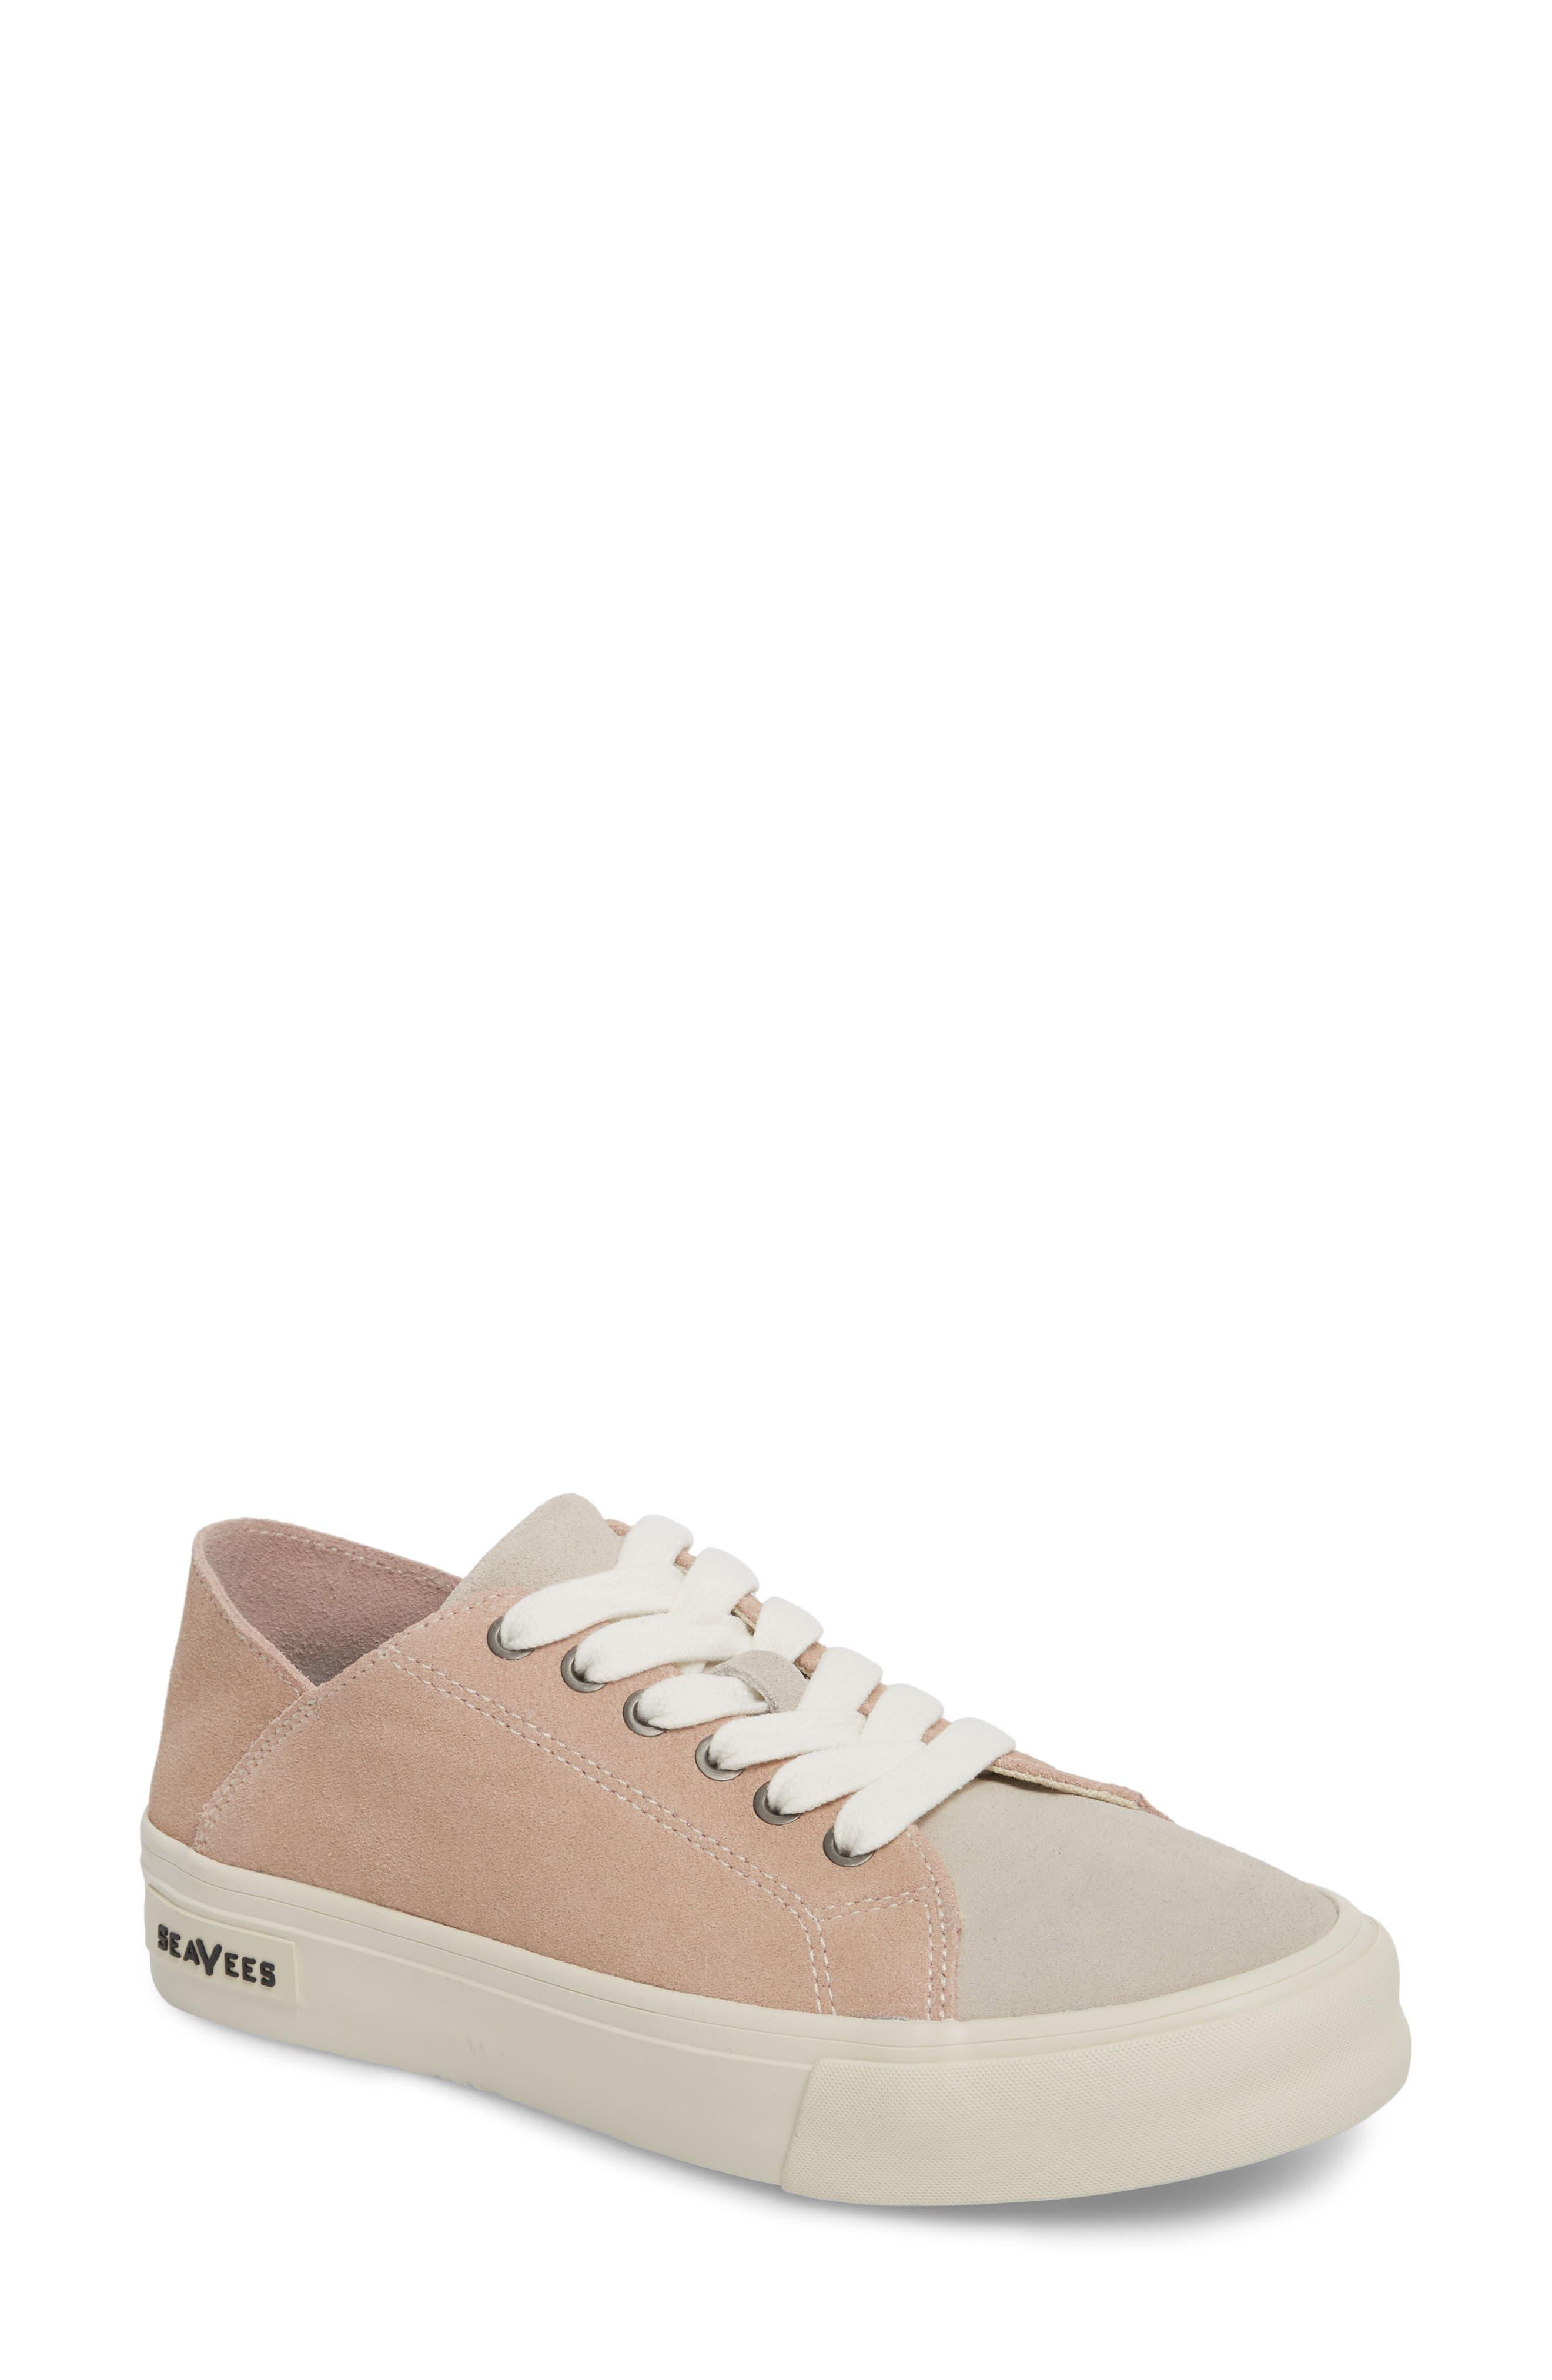 SeaVees Sausalito Sneaker (Women)